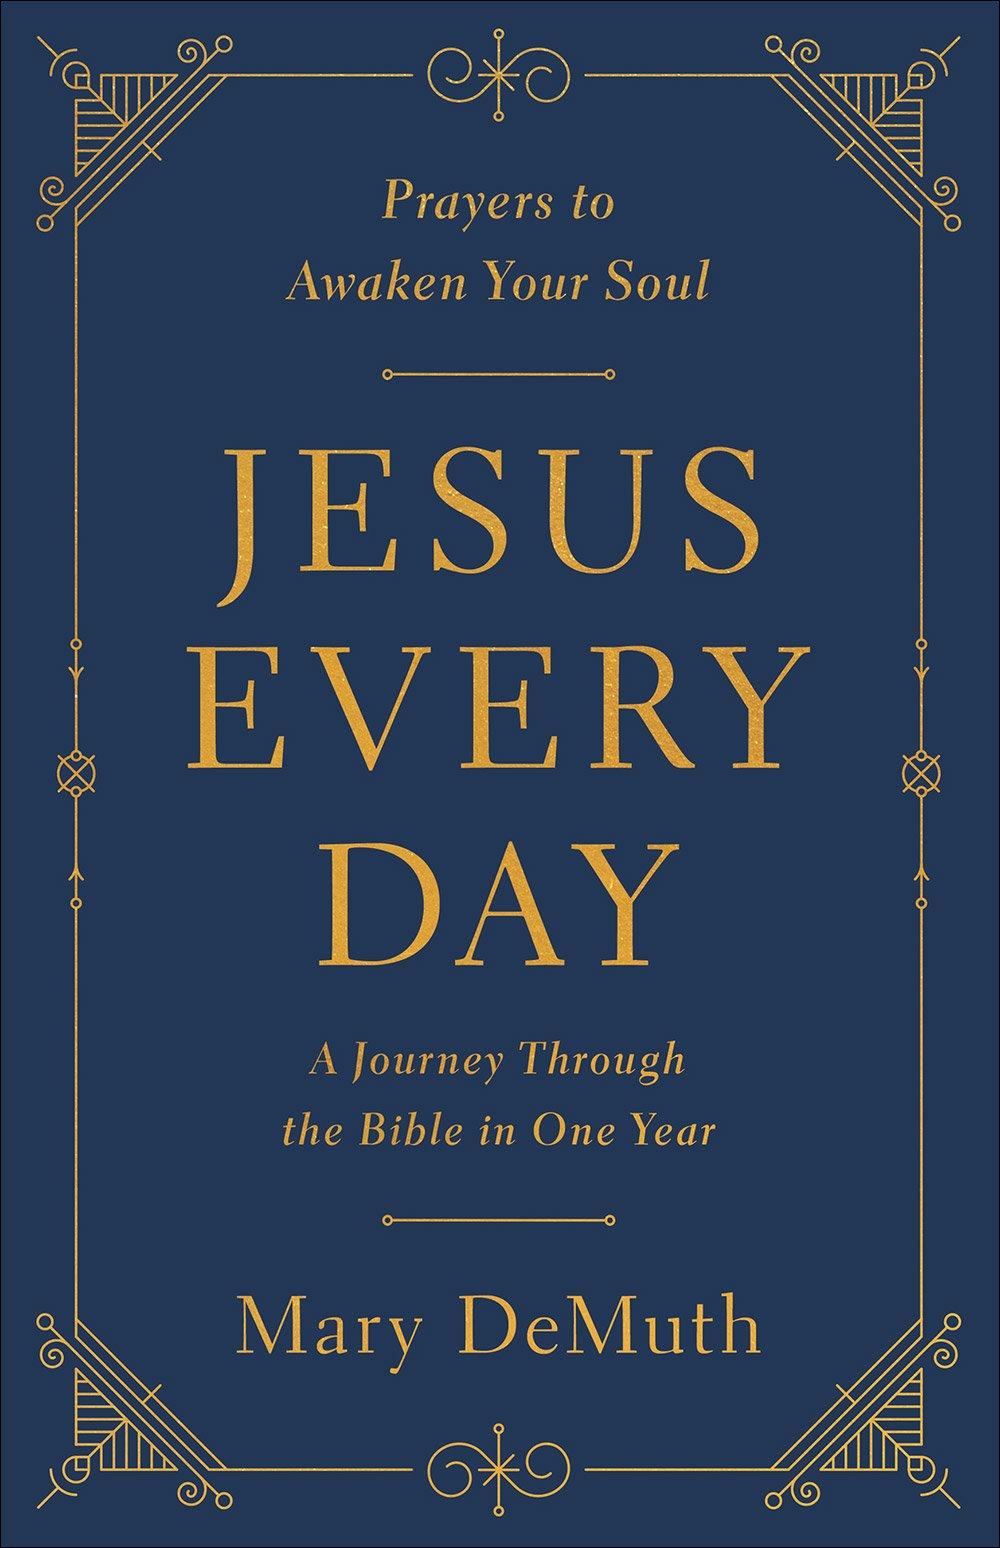 Jesus-Every-Day.jpg